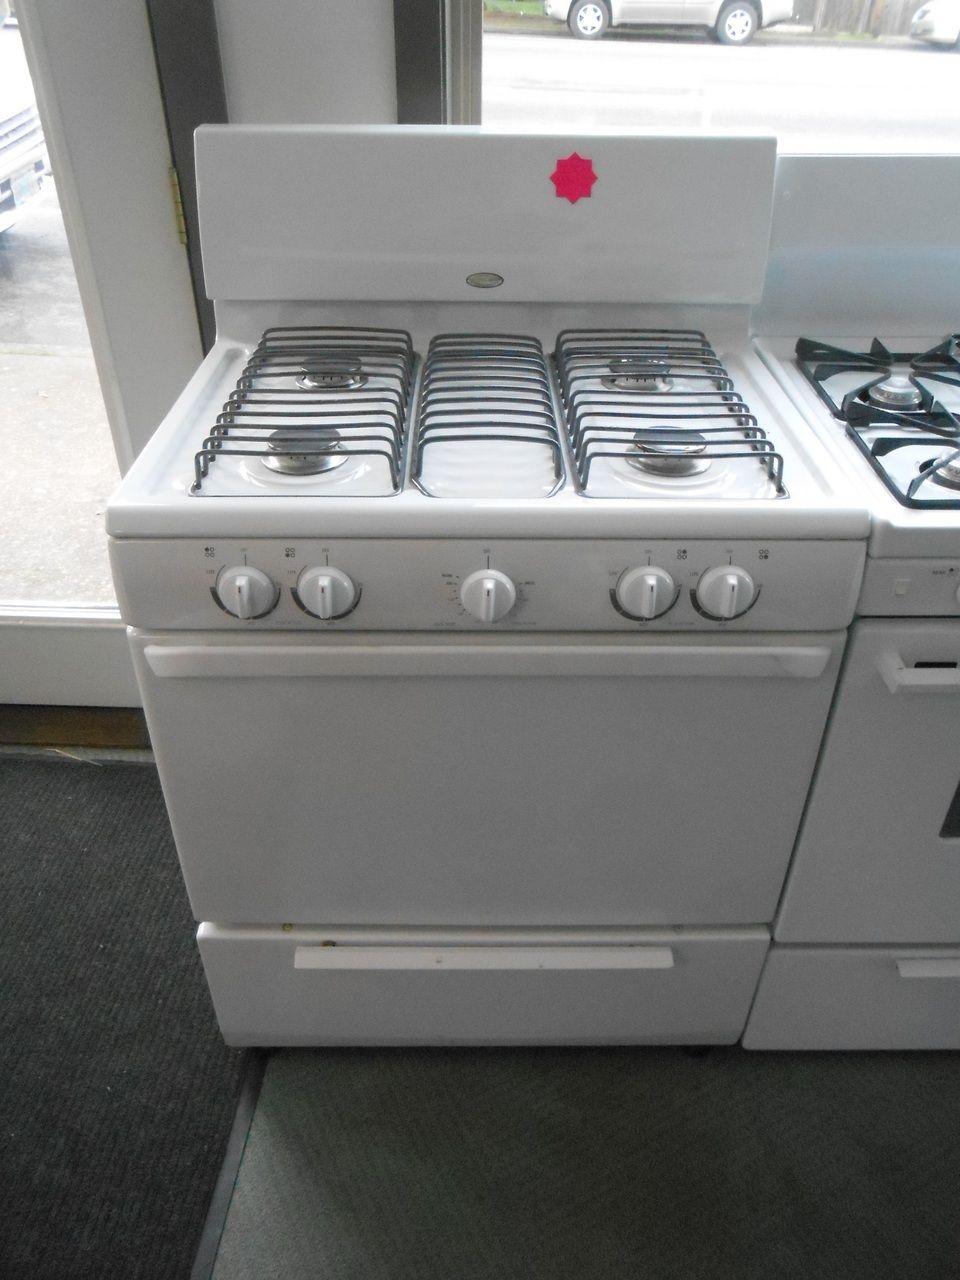 Whirlpool 5 burner gas range - Appliance City Whirlpool 30 Inch Gas Freestanding Standard Clean Range Electronic Ignition 4 Burner Broiler